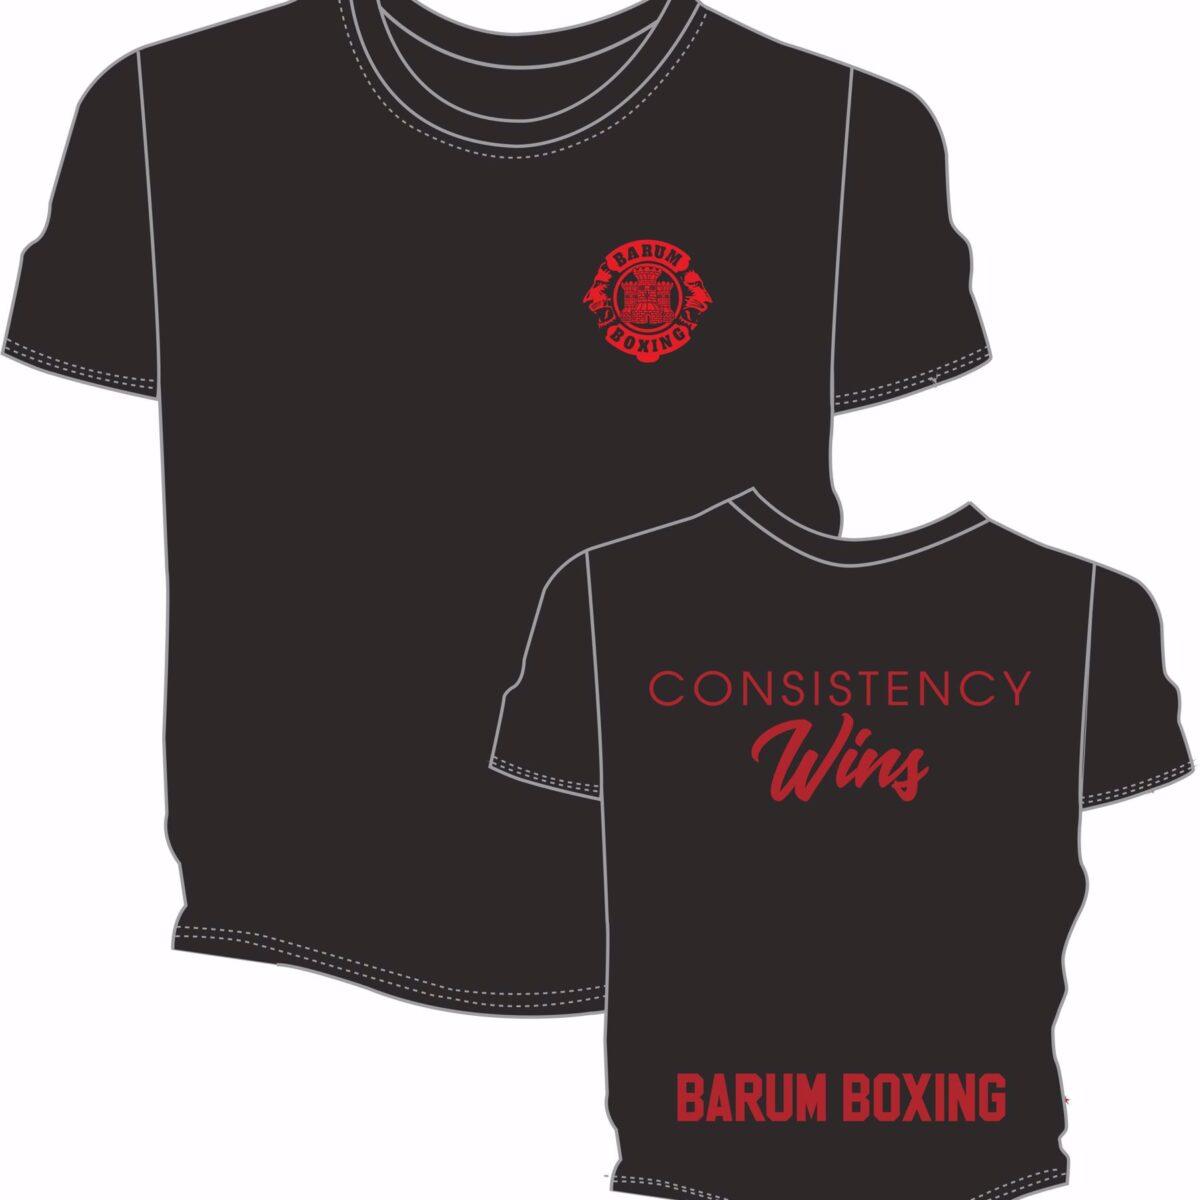 Consistency Wins Junior T Shirt